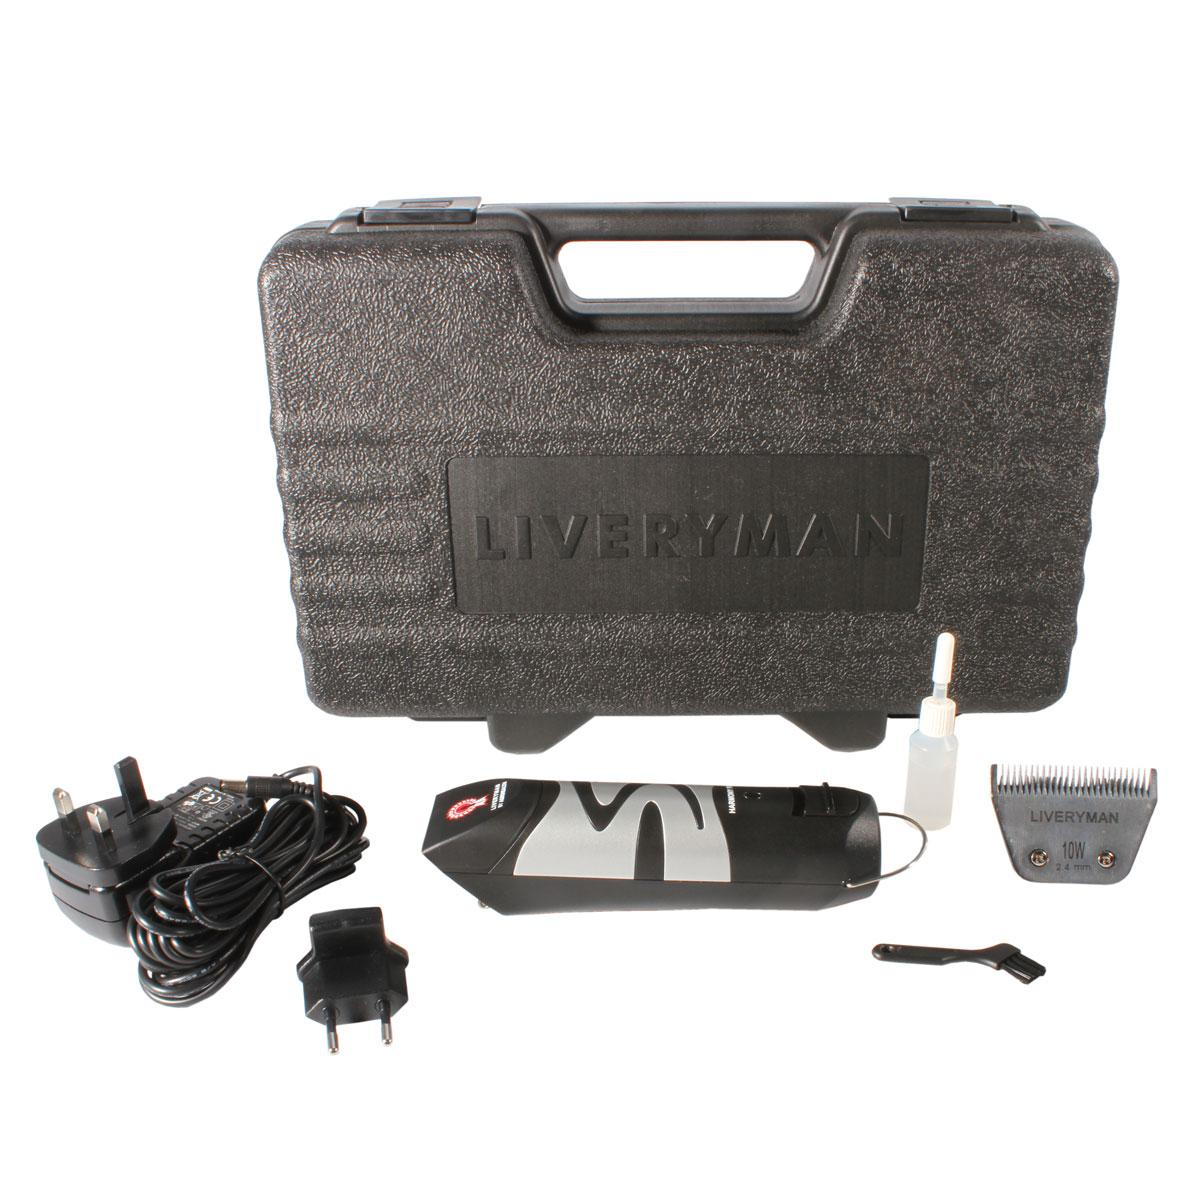 Liveryman Clipper Harmony Plus Battery Pack